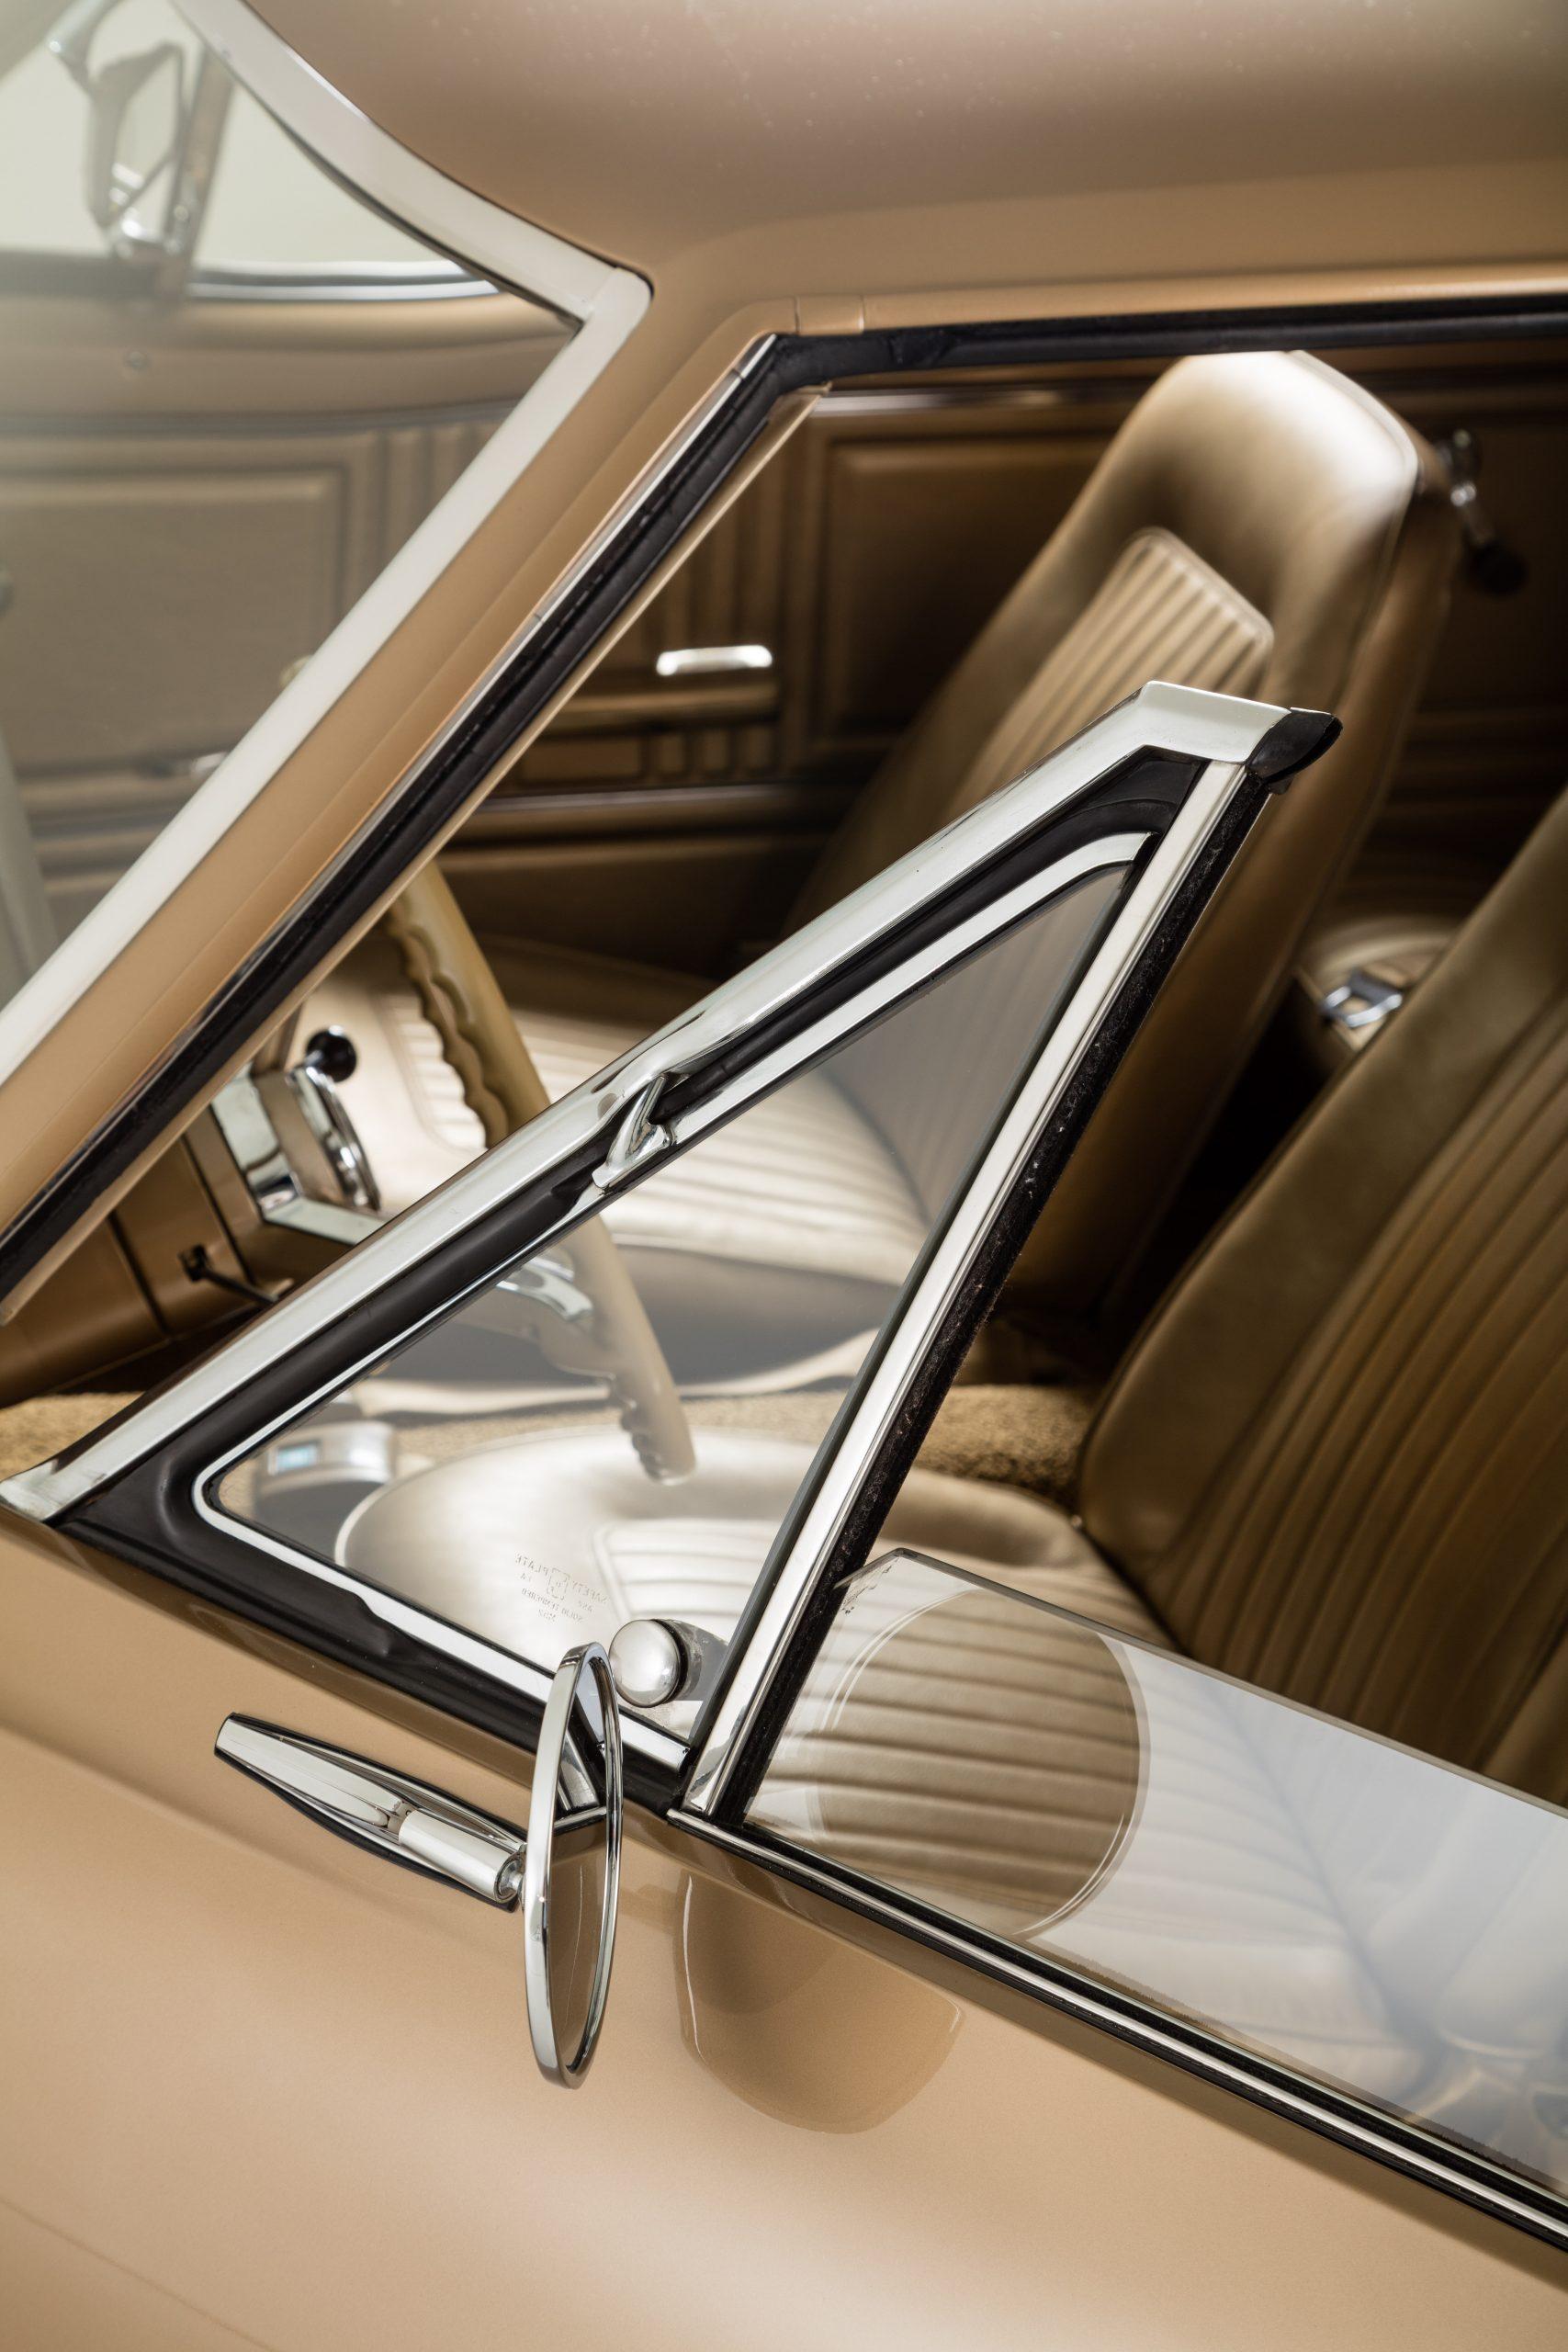 HVA - Chevrolet Camaro N100001 - Closeup drivers window and mirror